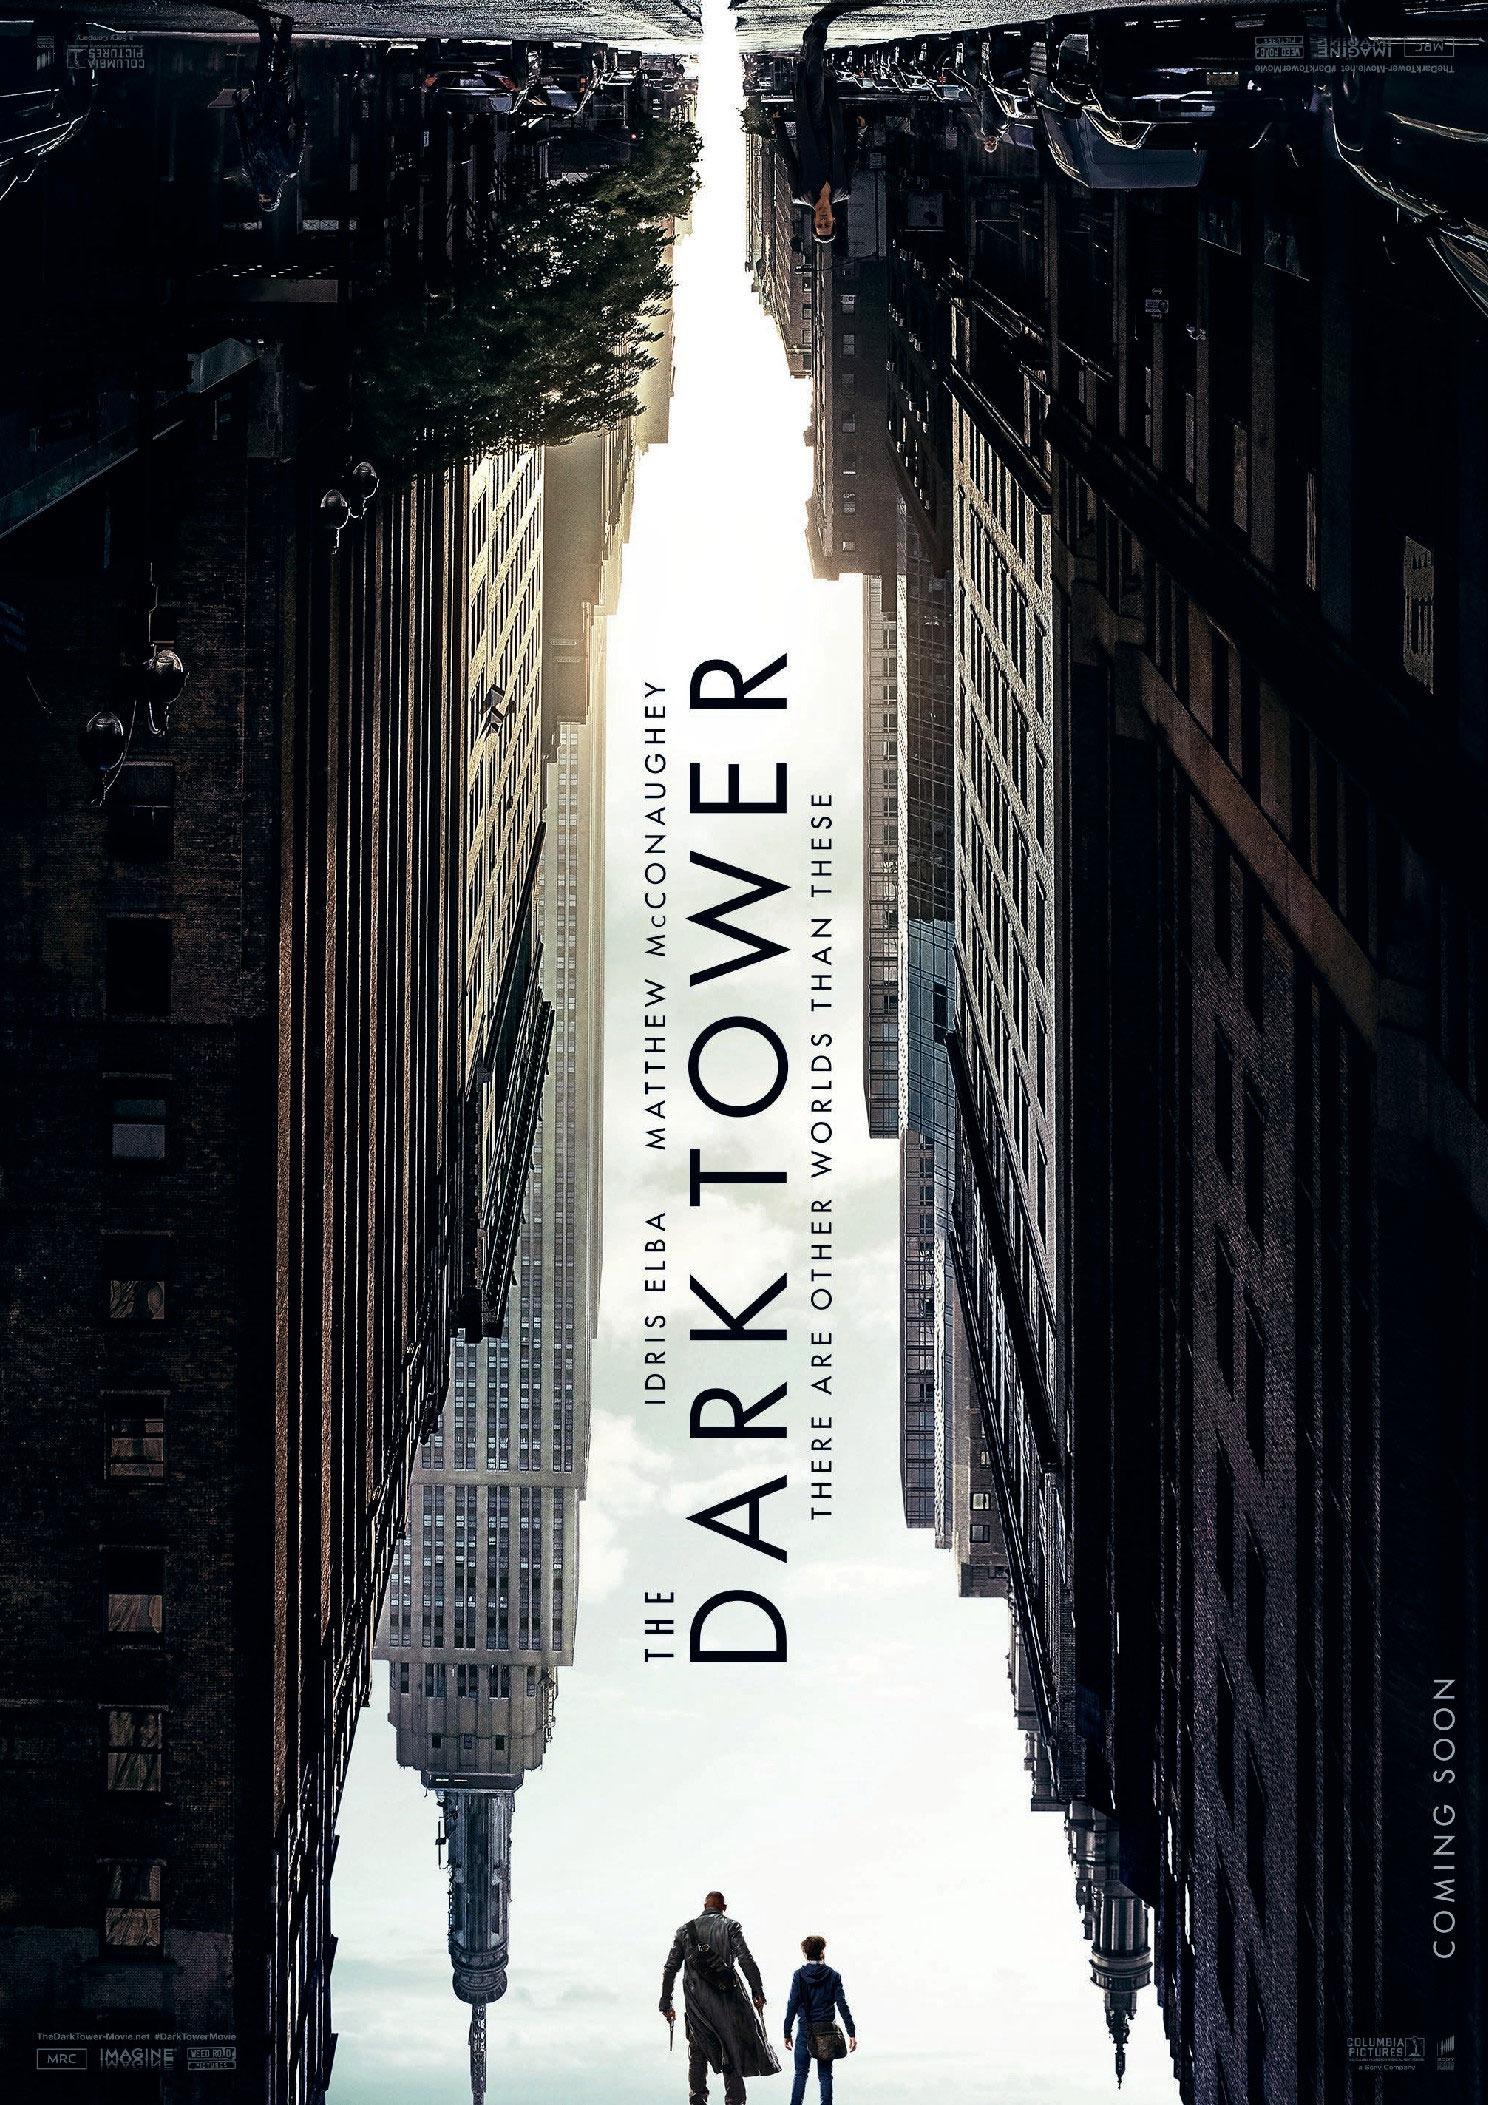 367-dark_tower_xxlg.jpg